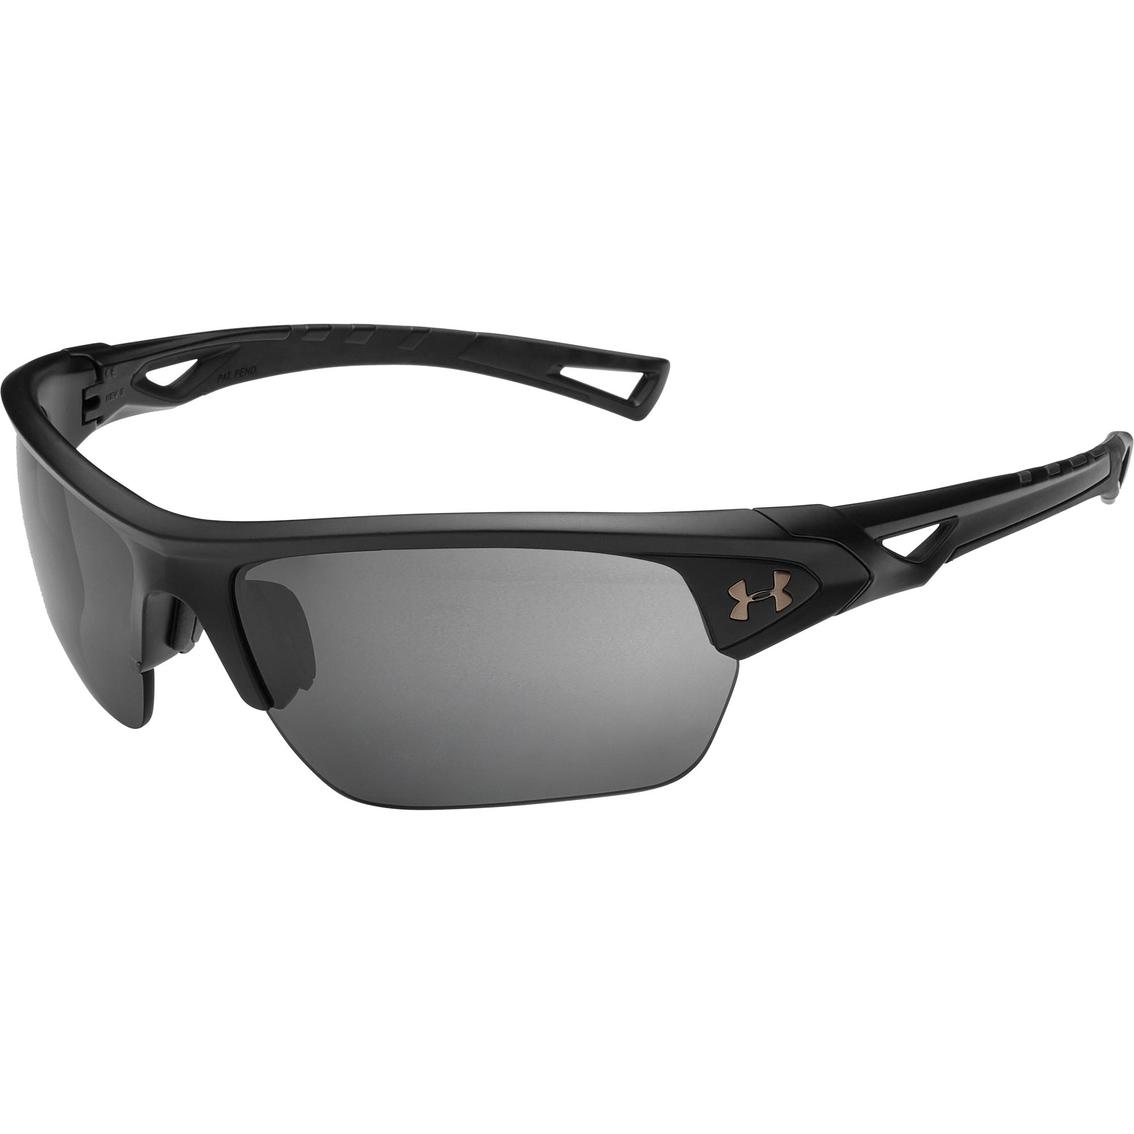 6ca6443b91 Under Armour UA Octane Satin Polarized Mirror Sunglasses 8640094-010118